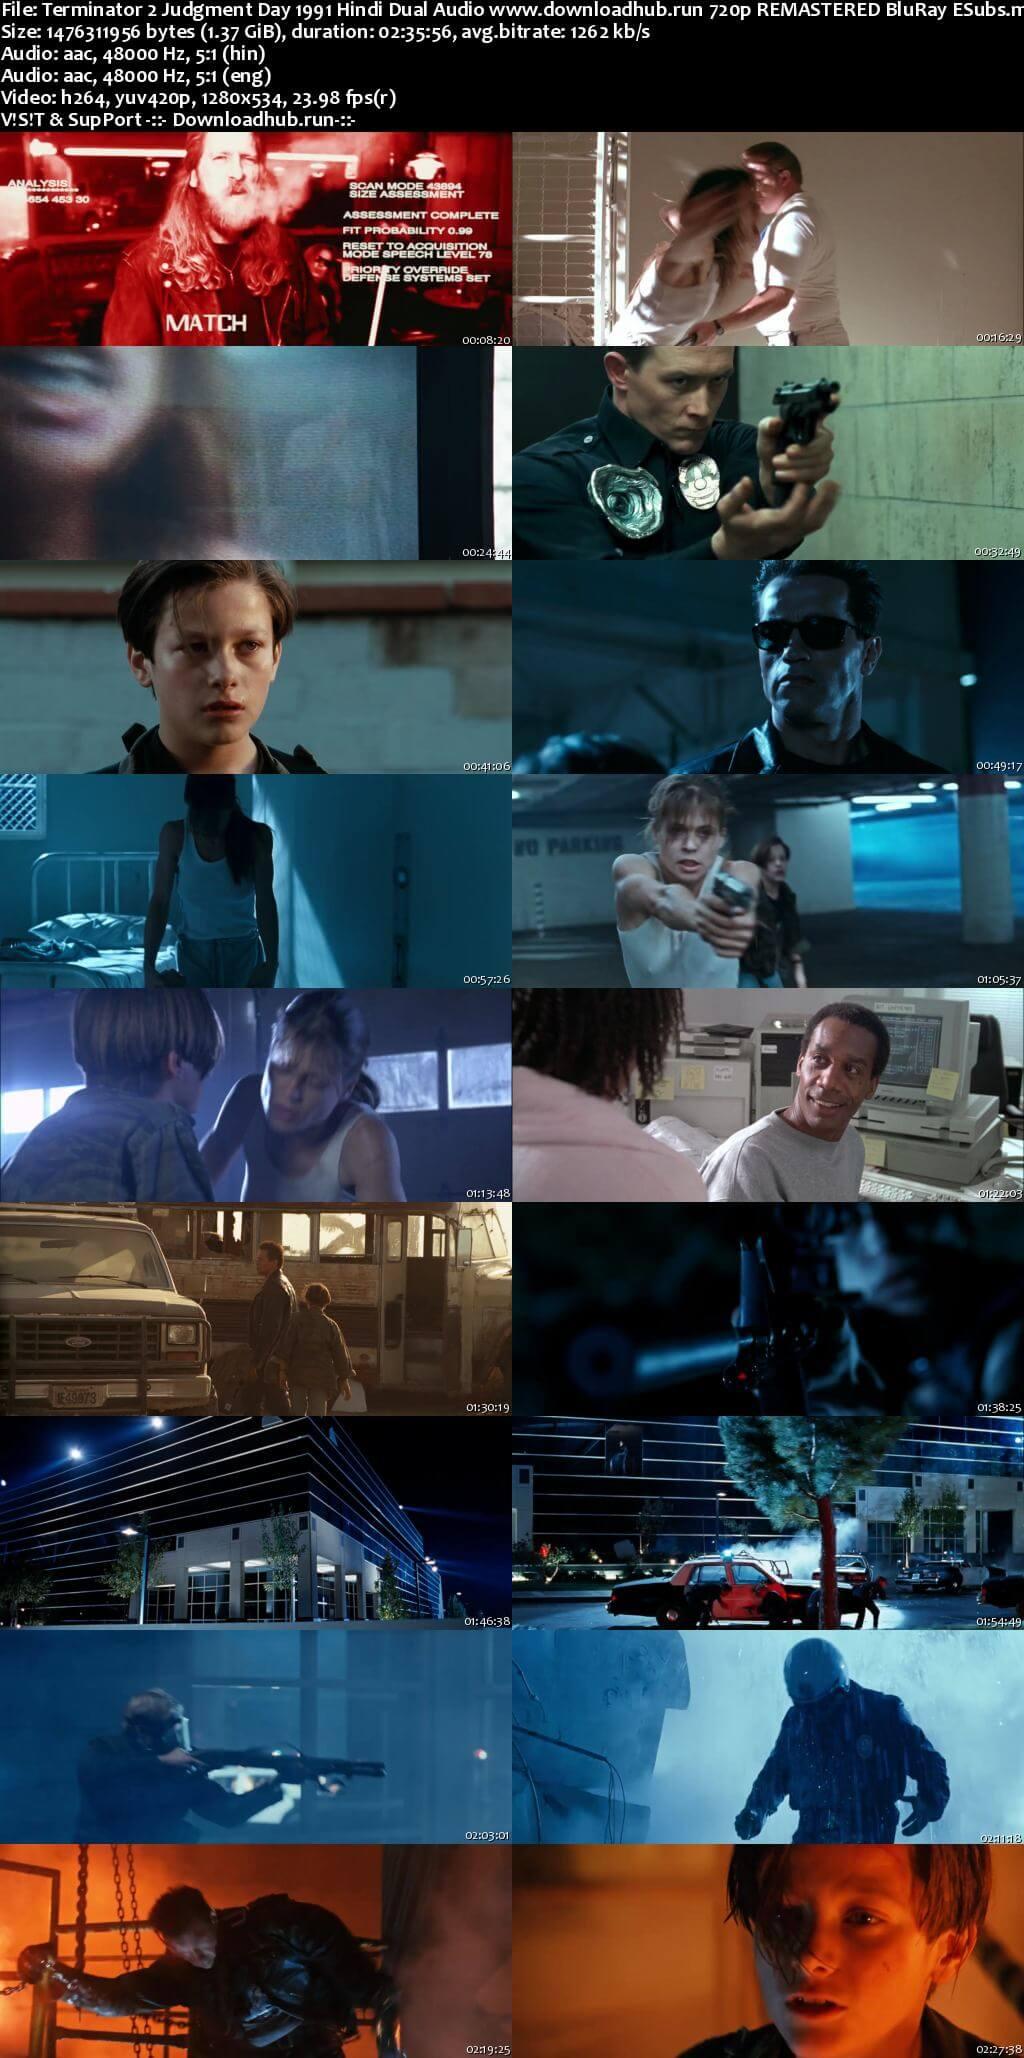 Terminator 2 Judgment Day 1991 Hindi Dual Audio 720p REMASTERED BluRay ESubs